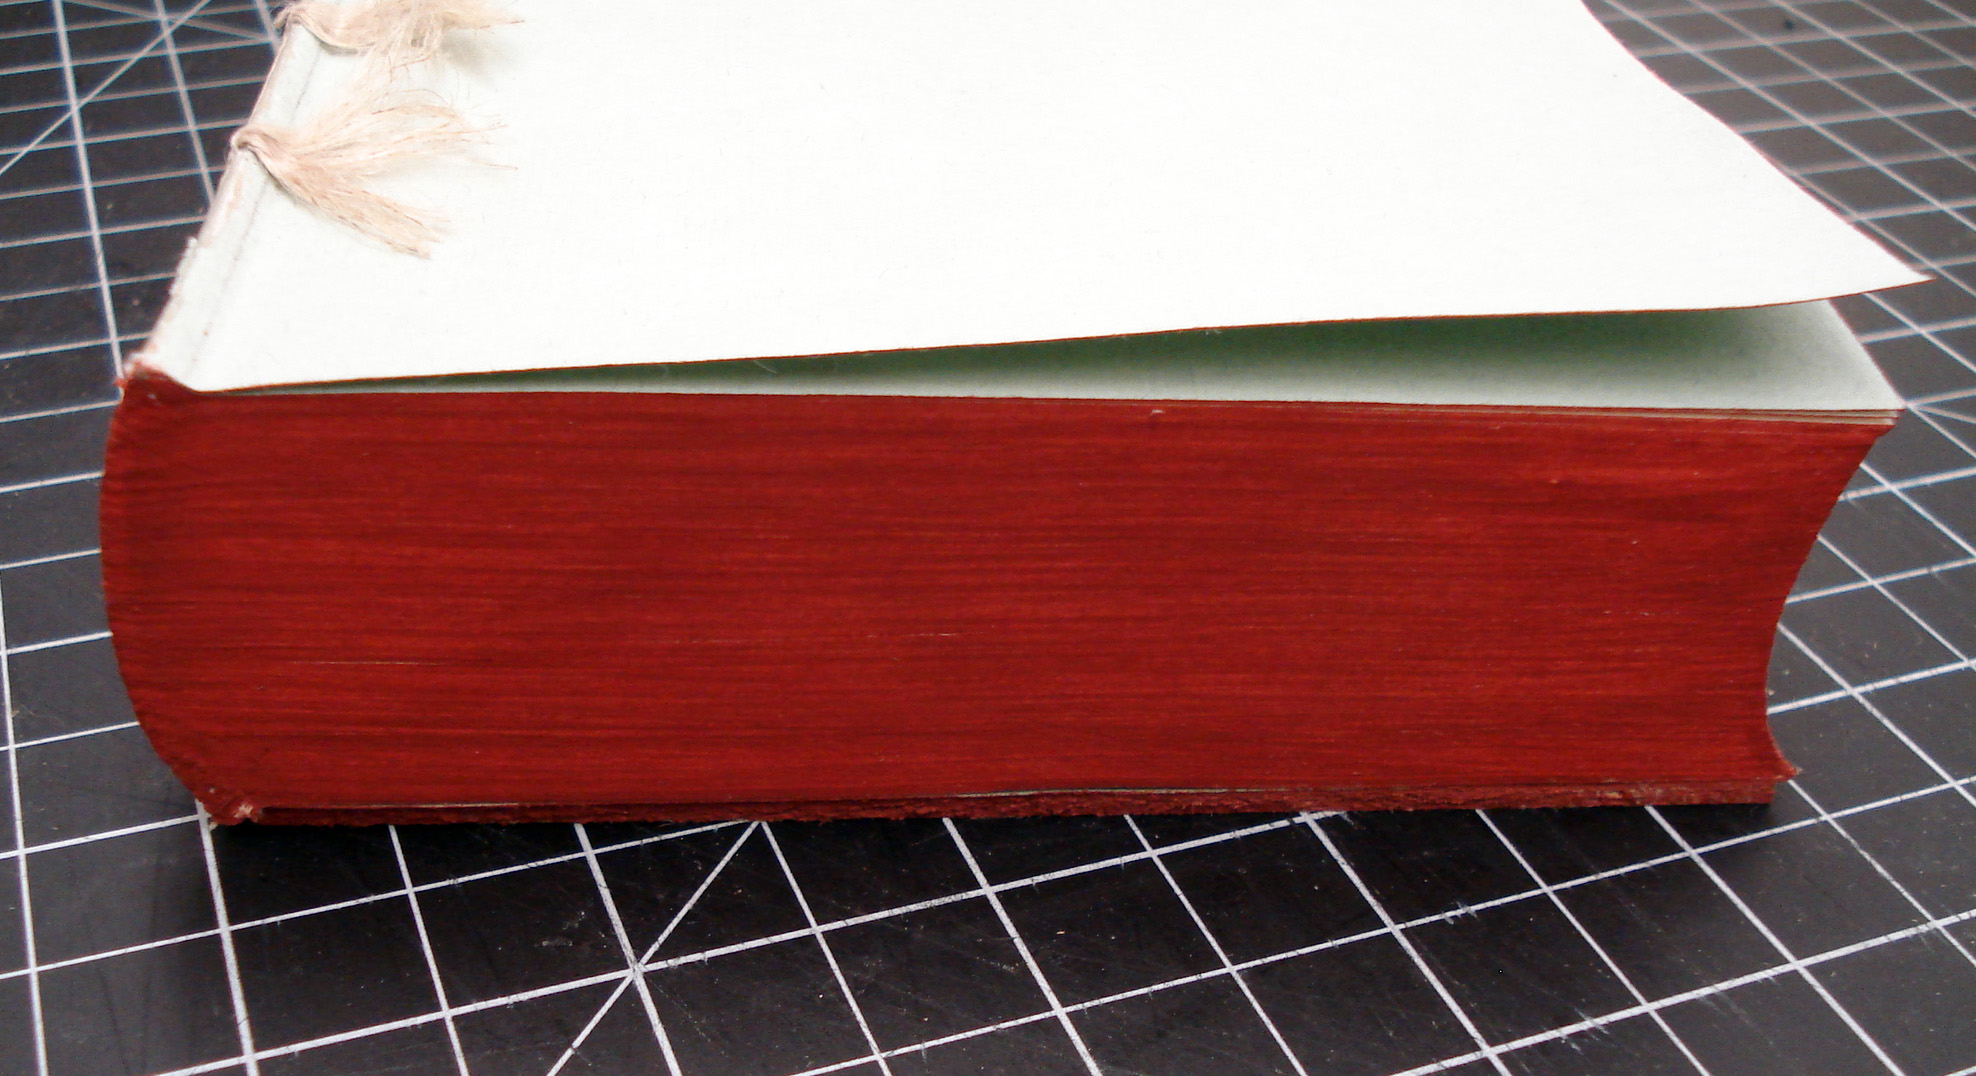 Colour book edges - Colour Book Edges 2